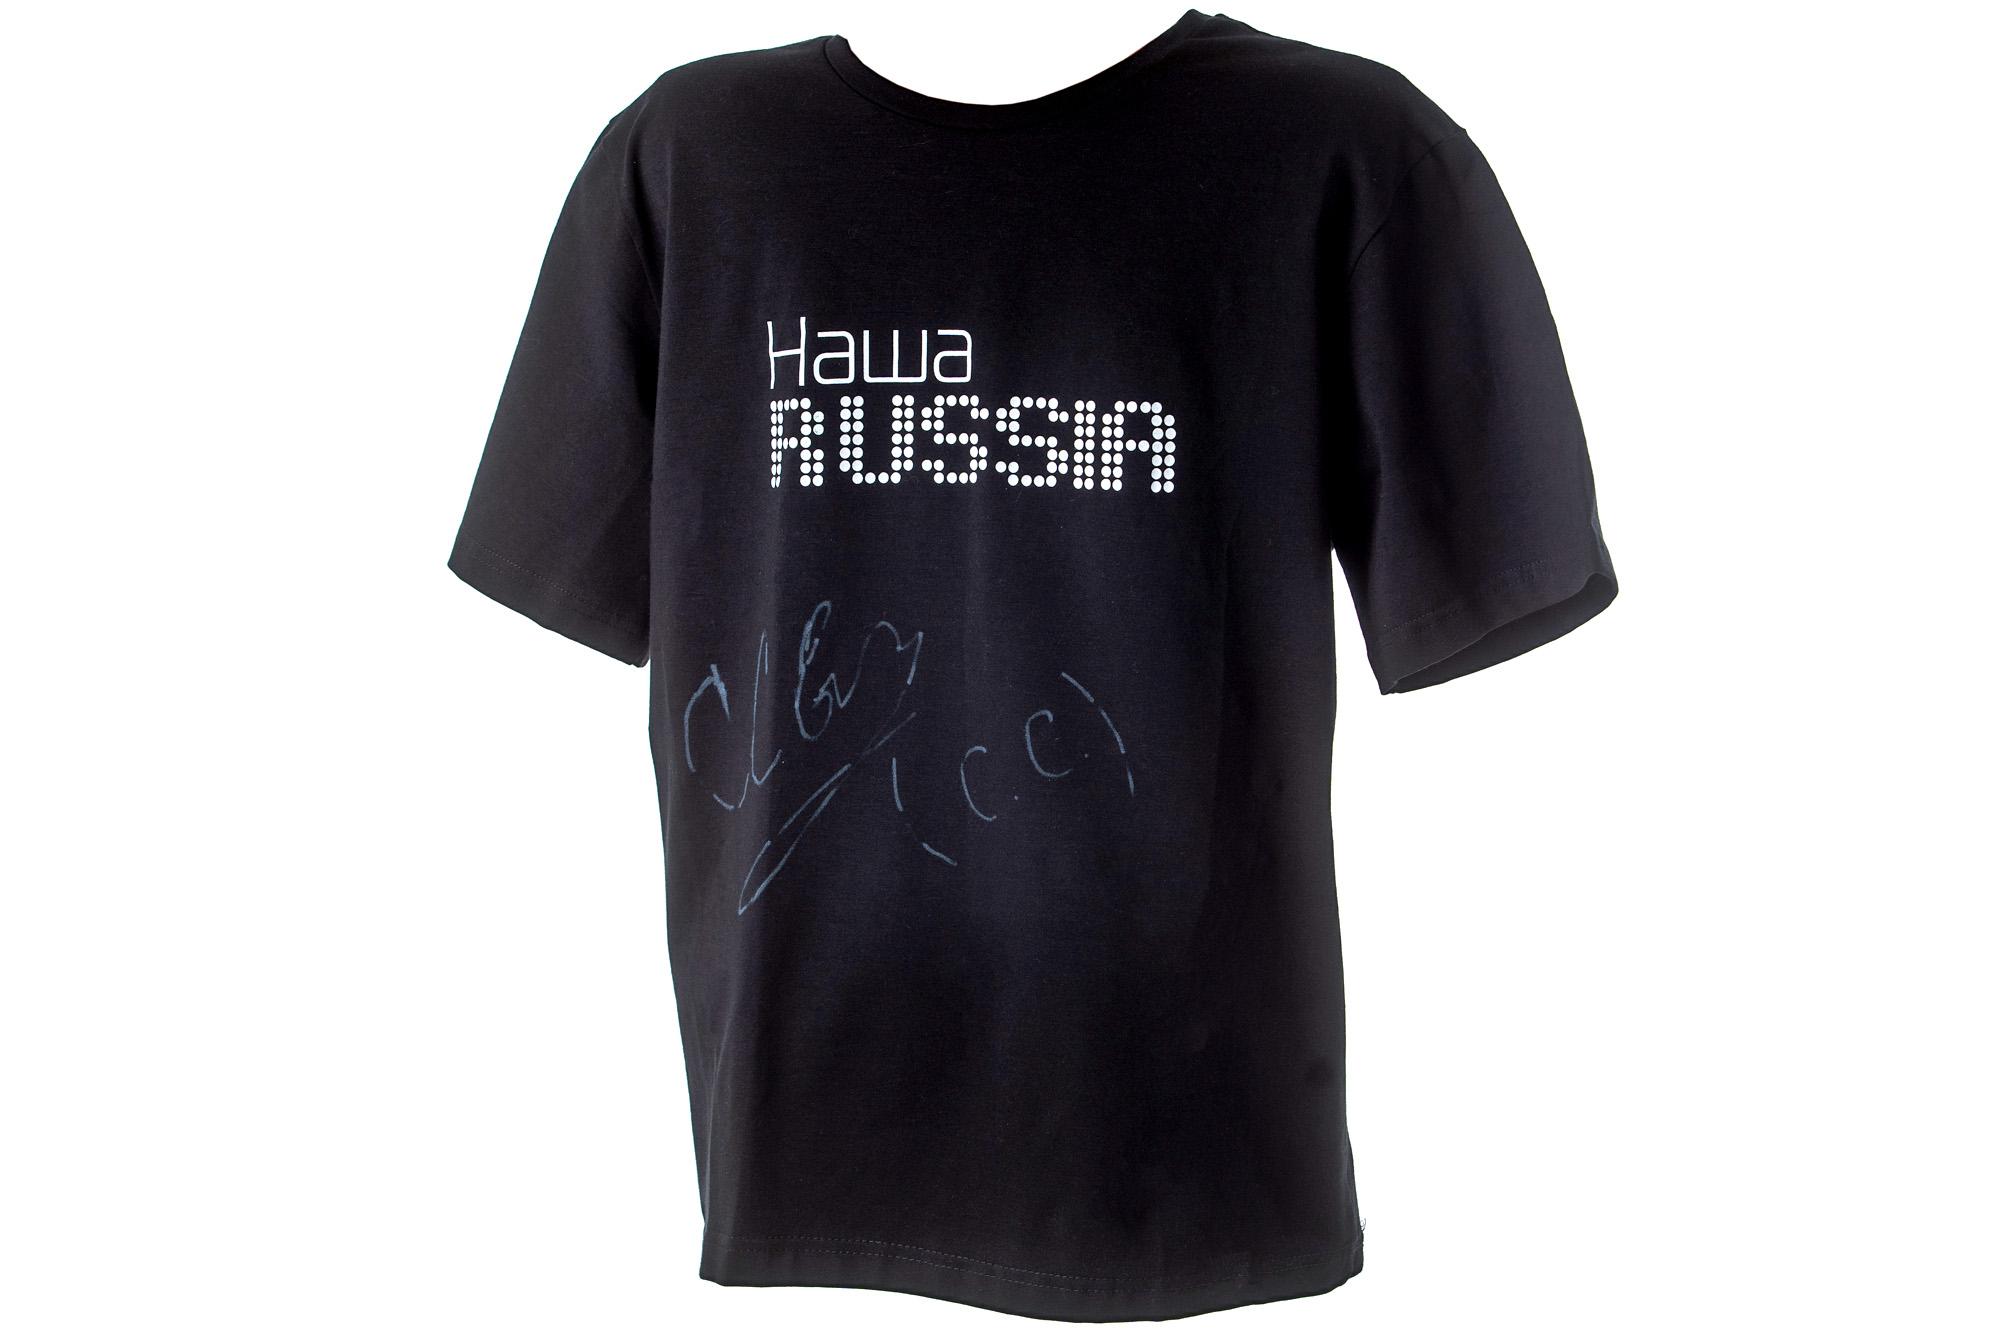 Футболка с автографом Сергея Светлакова